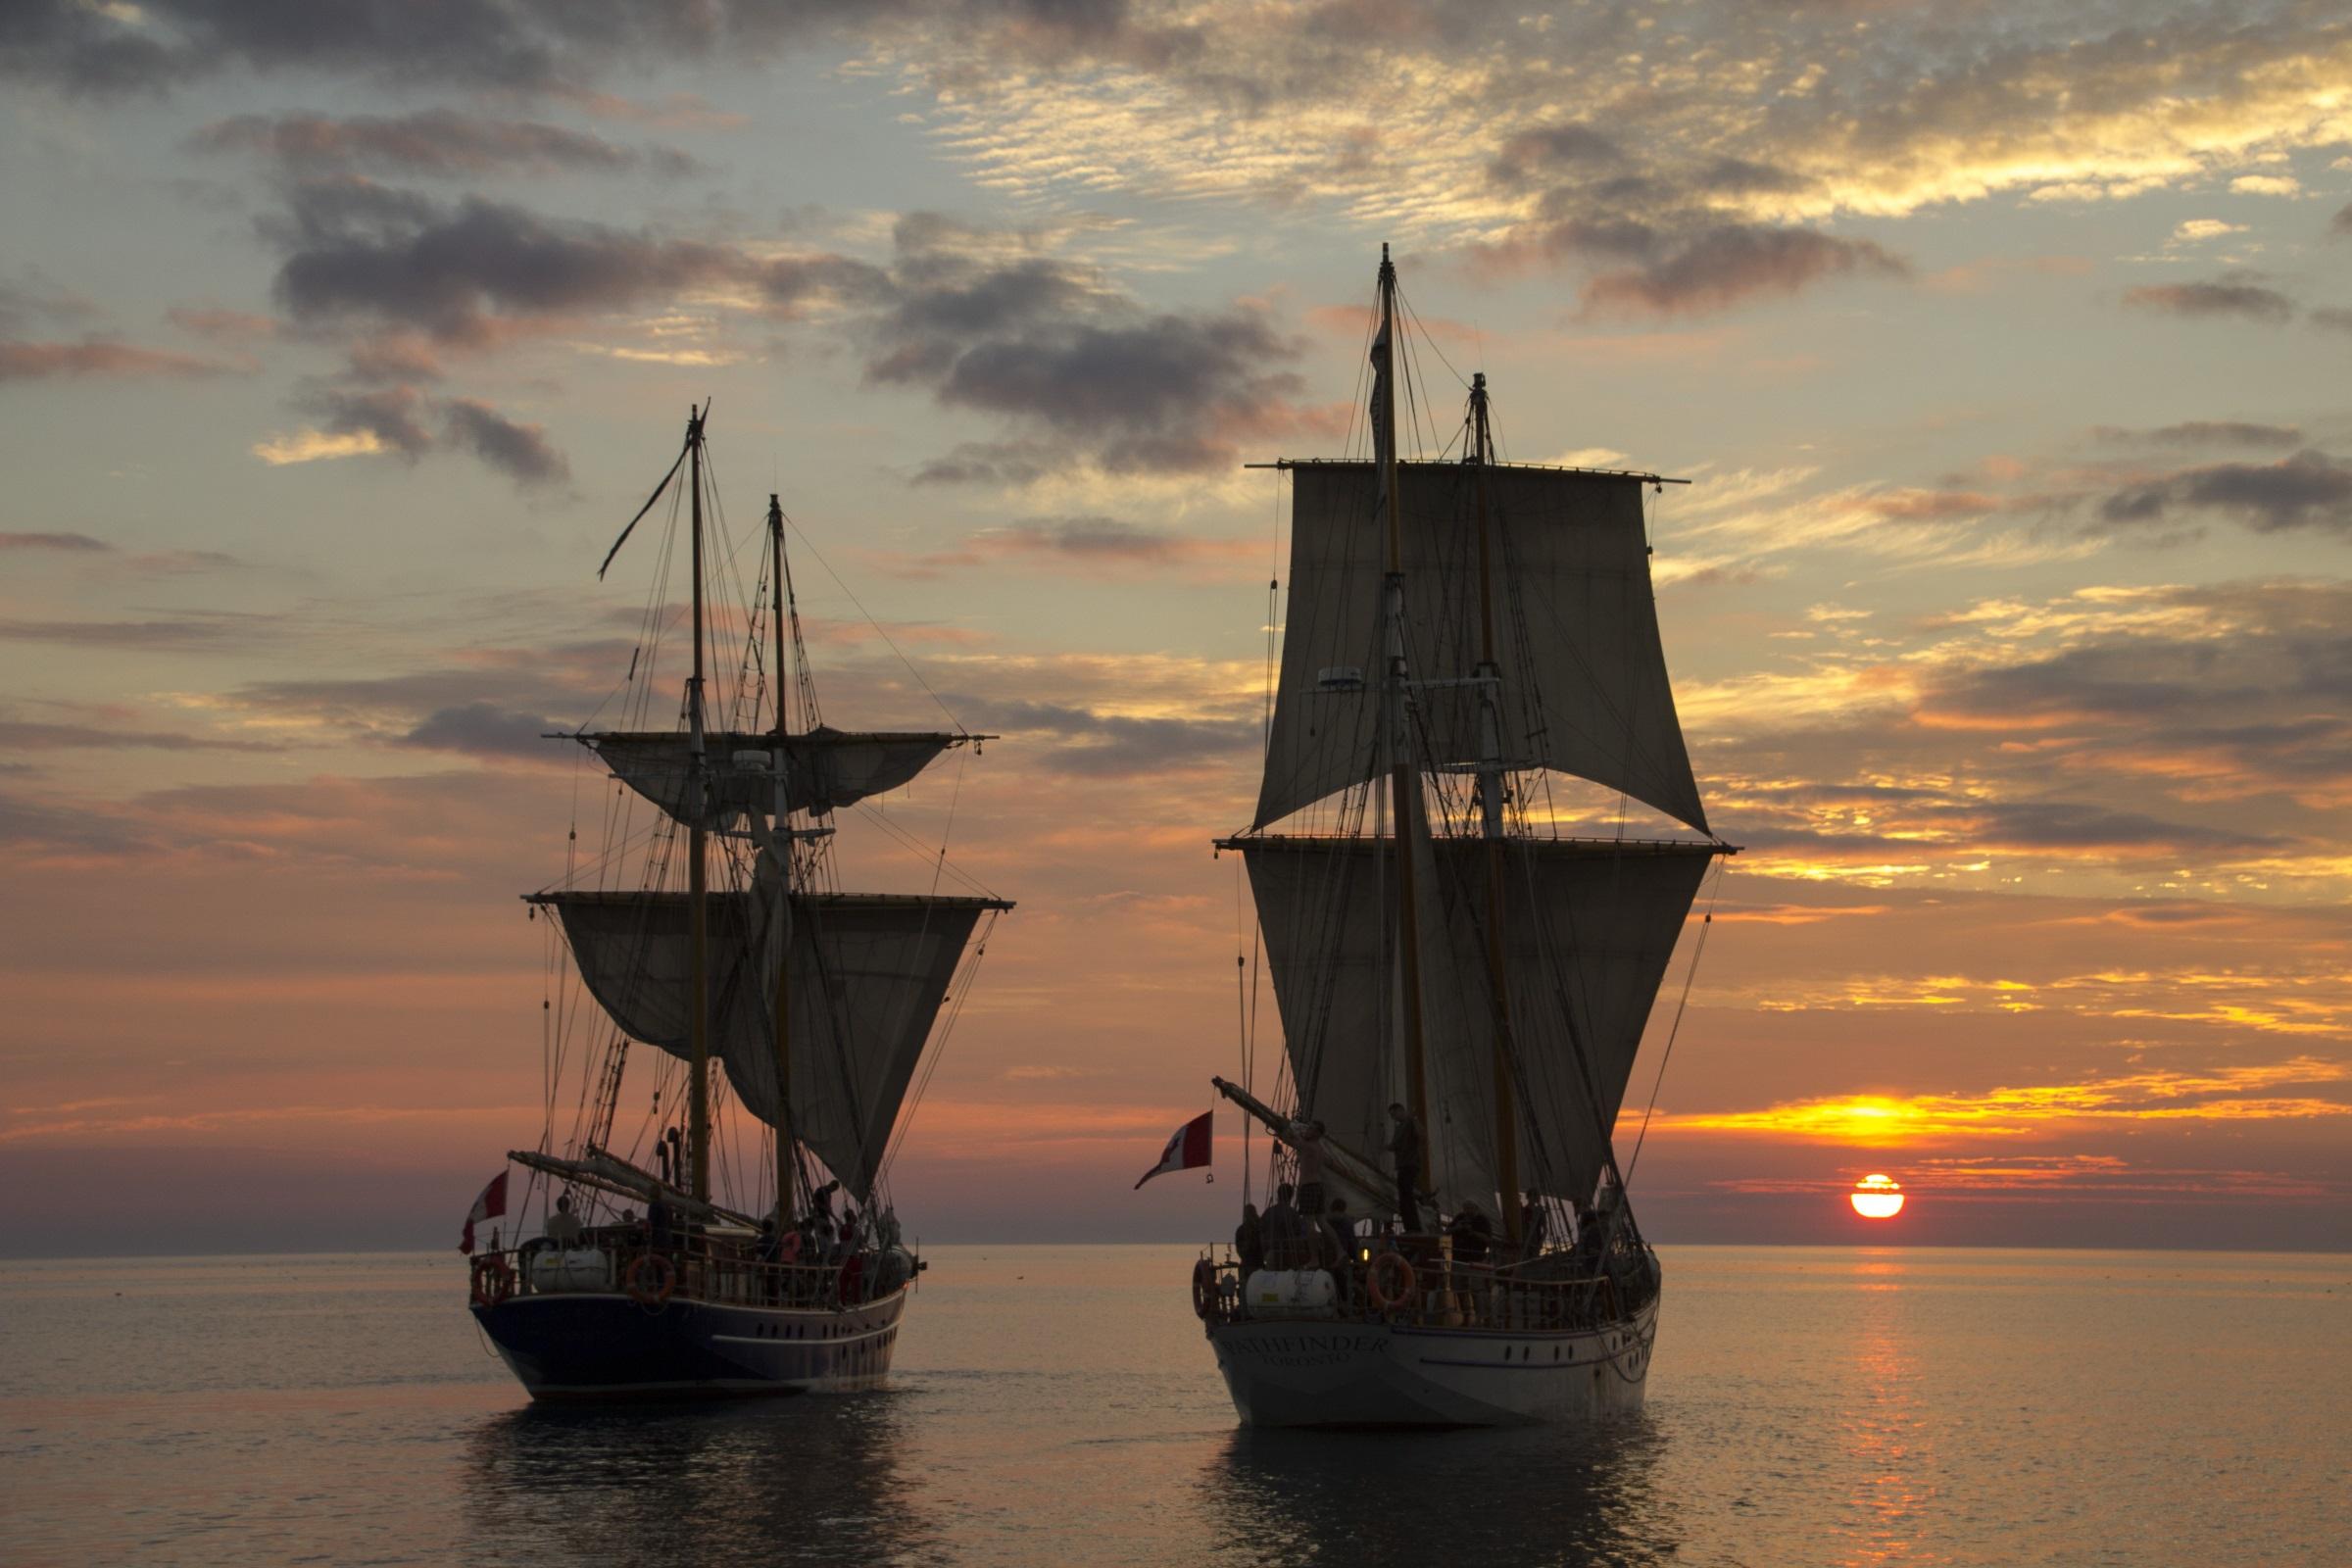 Tall Ships Sunset (Image resized)